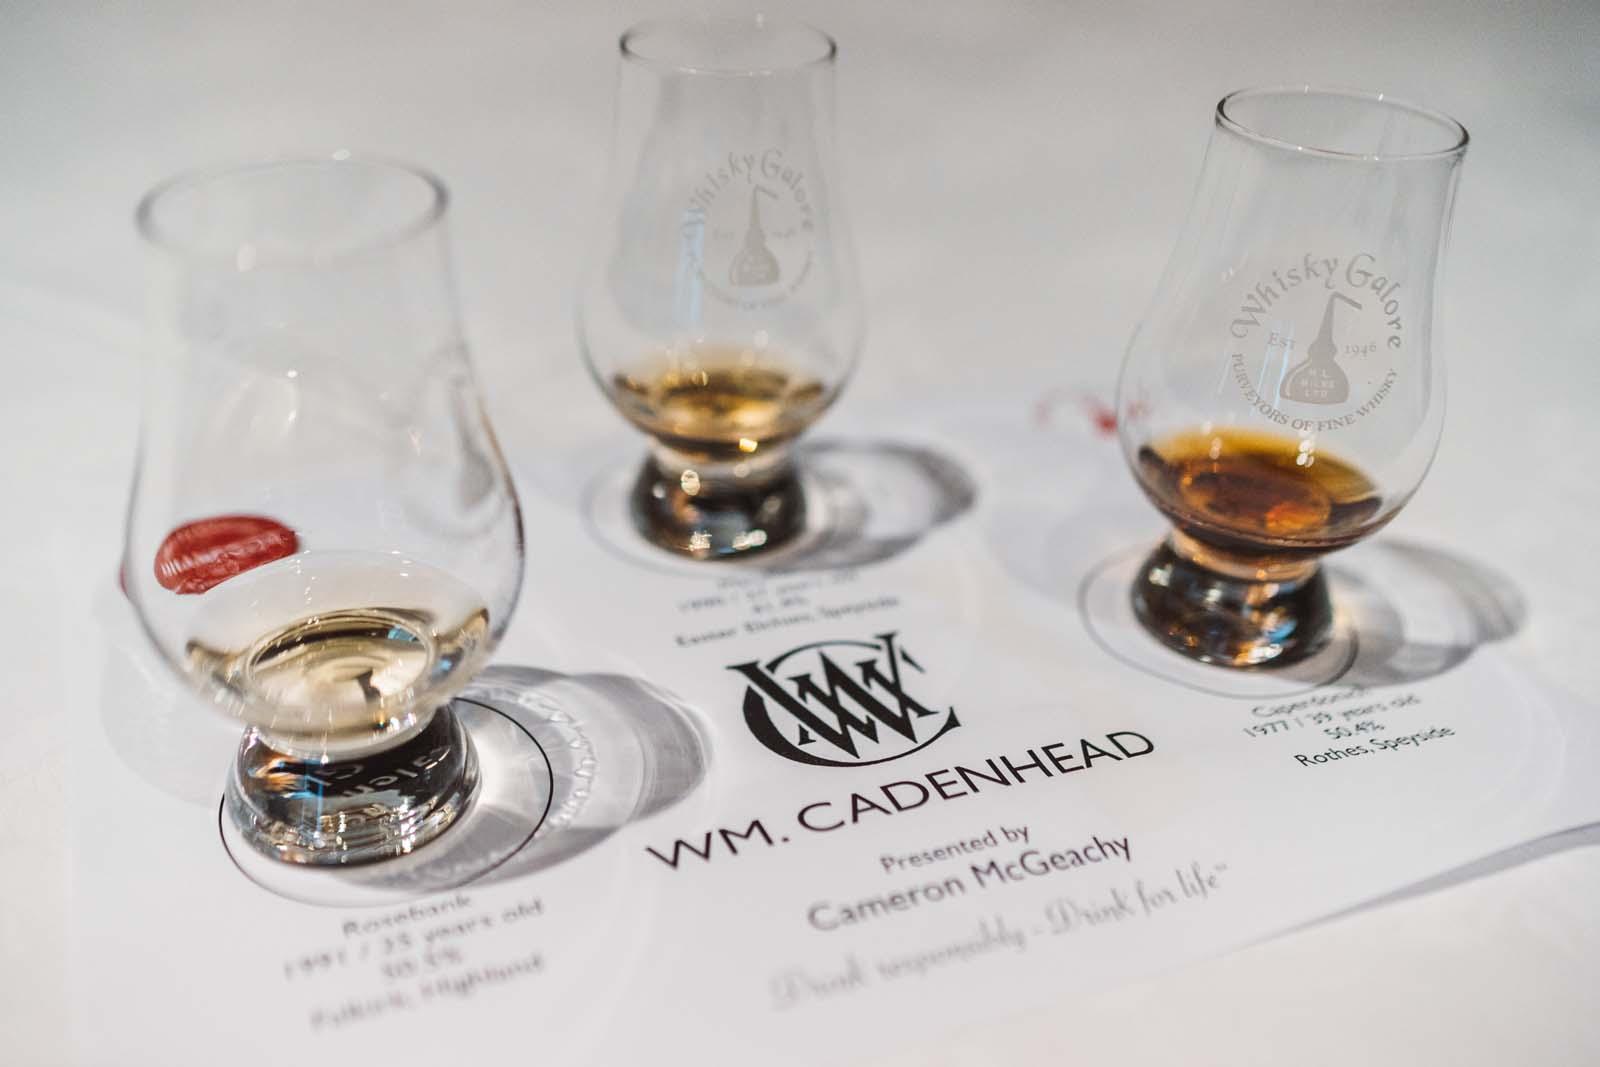 Dramfest 2018 for Whisky Galore-250.jpg